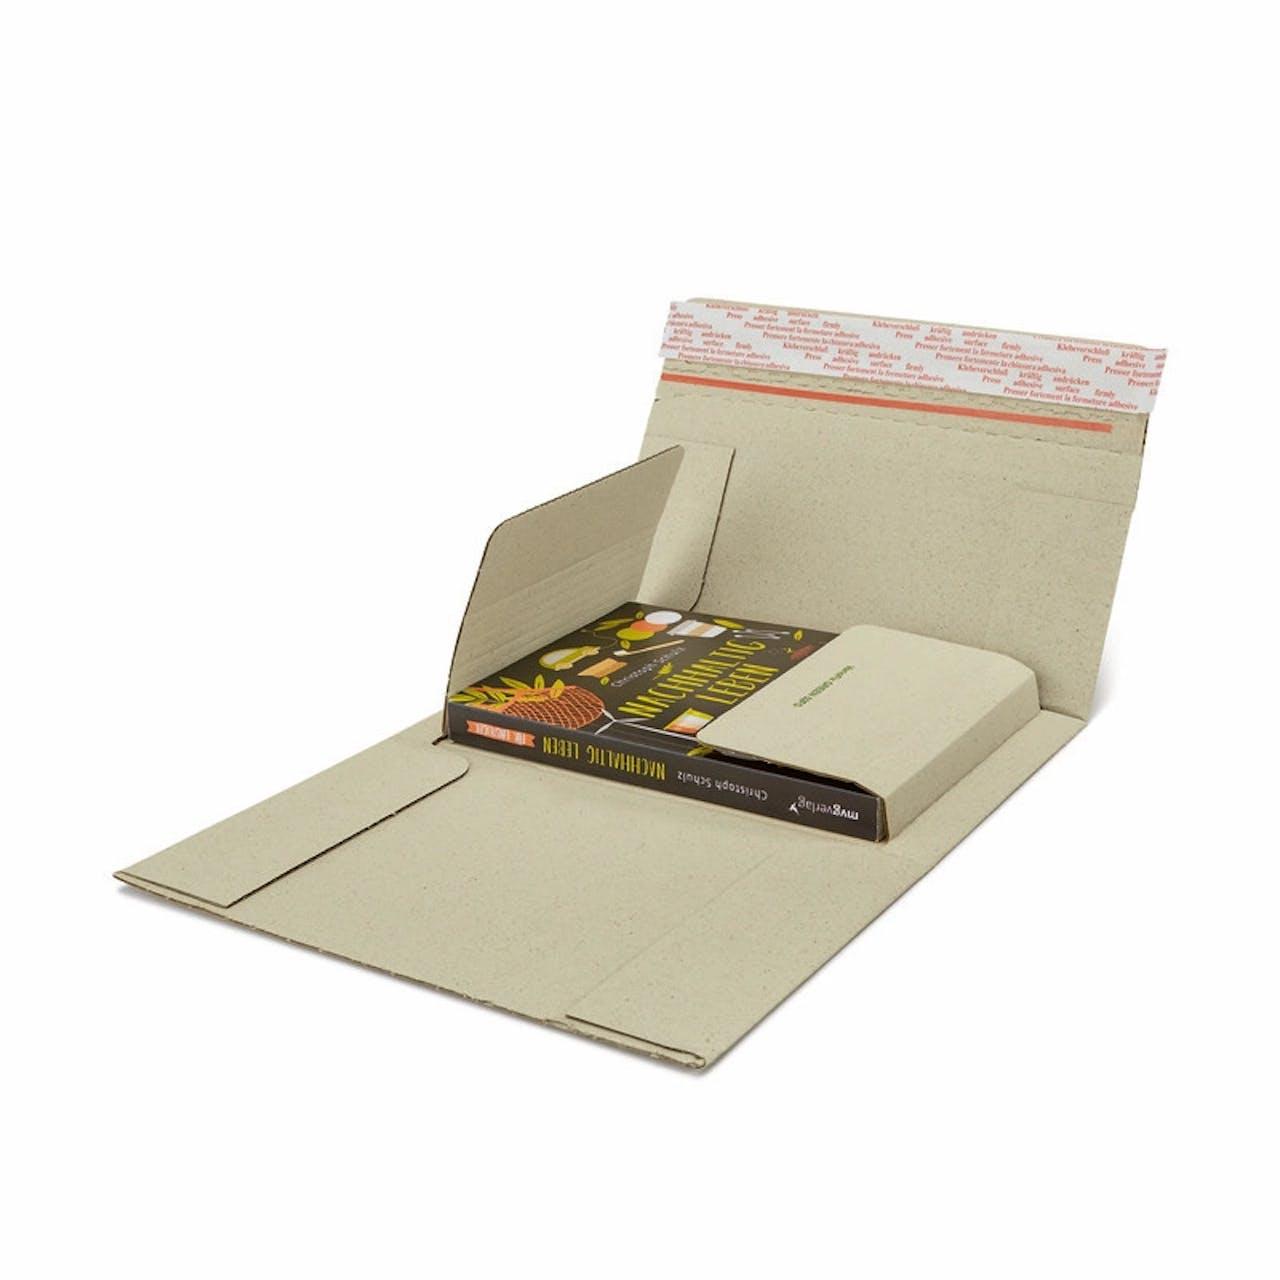 Graspapier-Universalverpackung terra